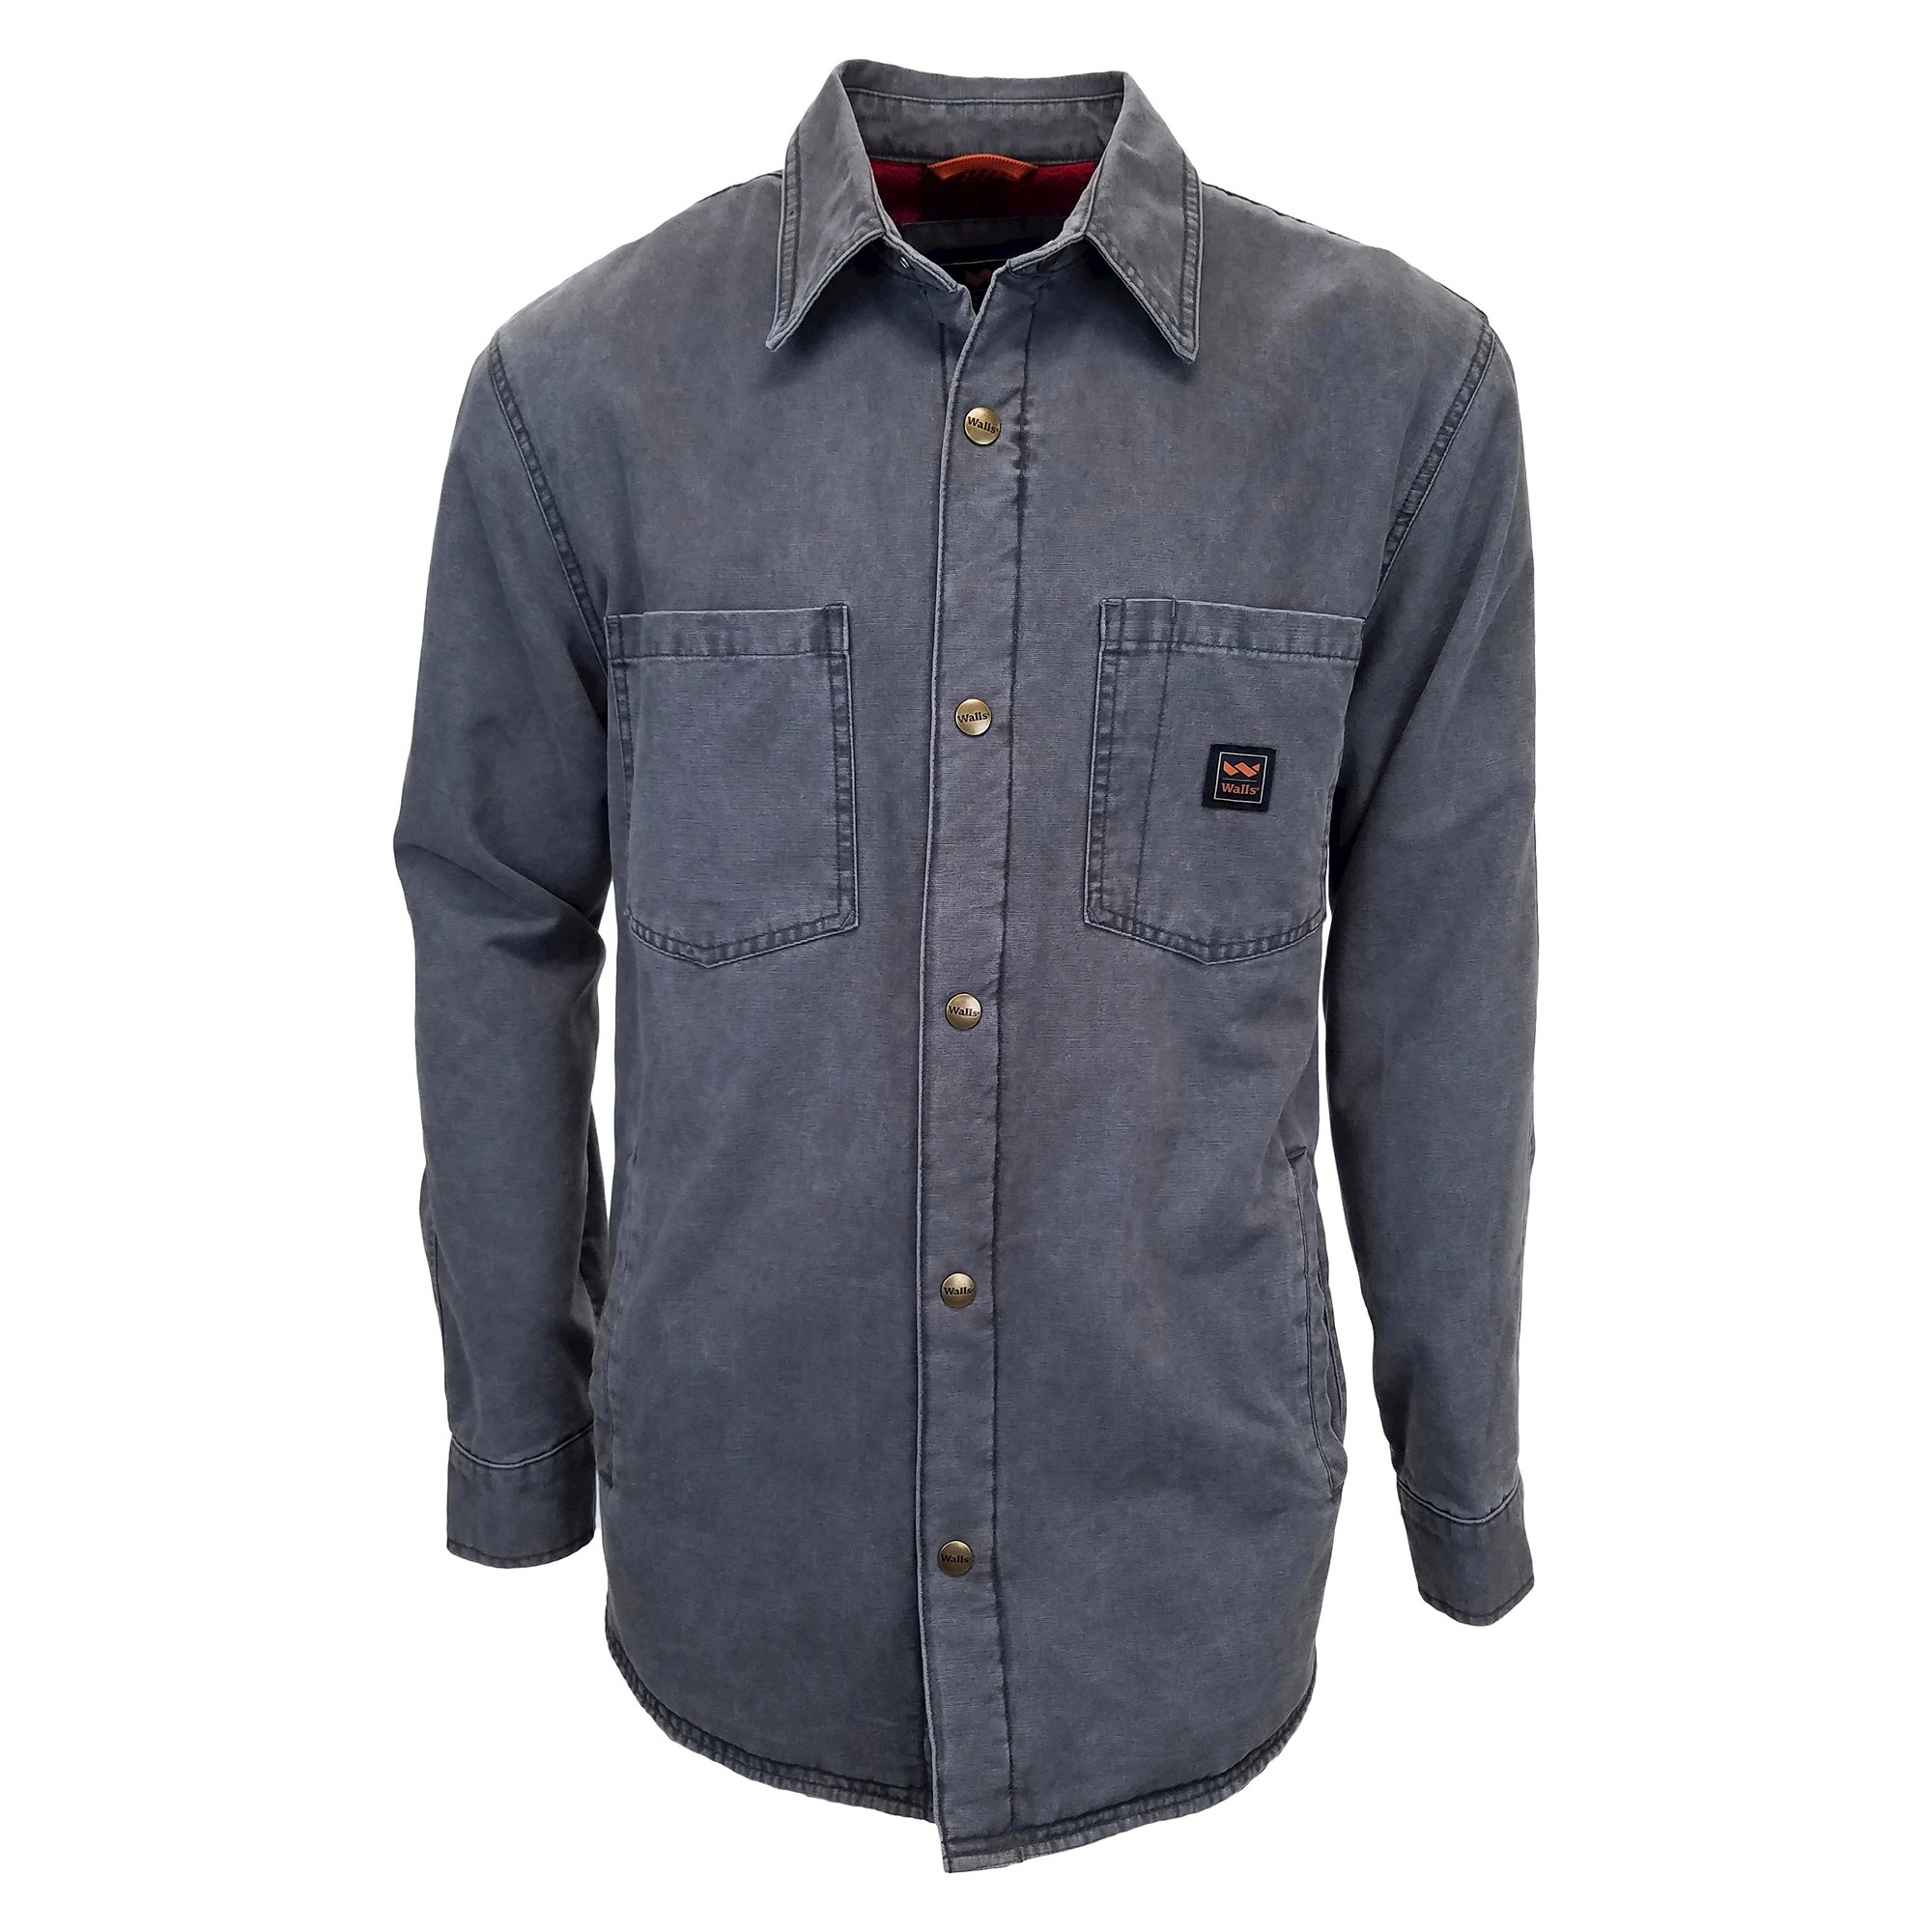 Walls Vintage Duck Shirt Jacket Big Tall Washed Graphite Grey